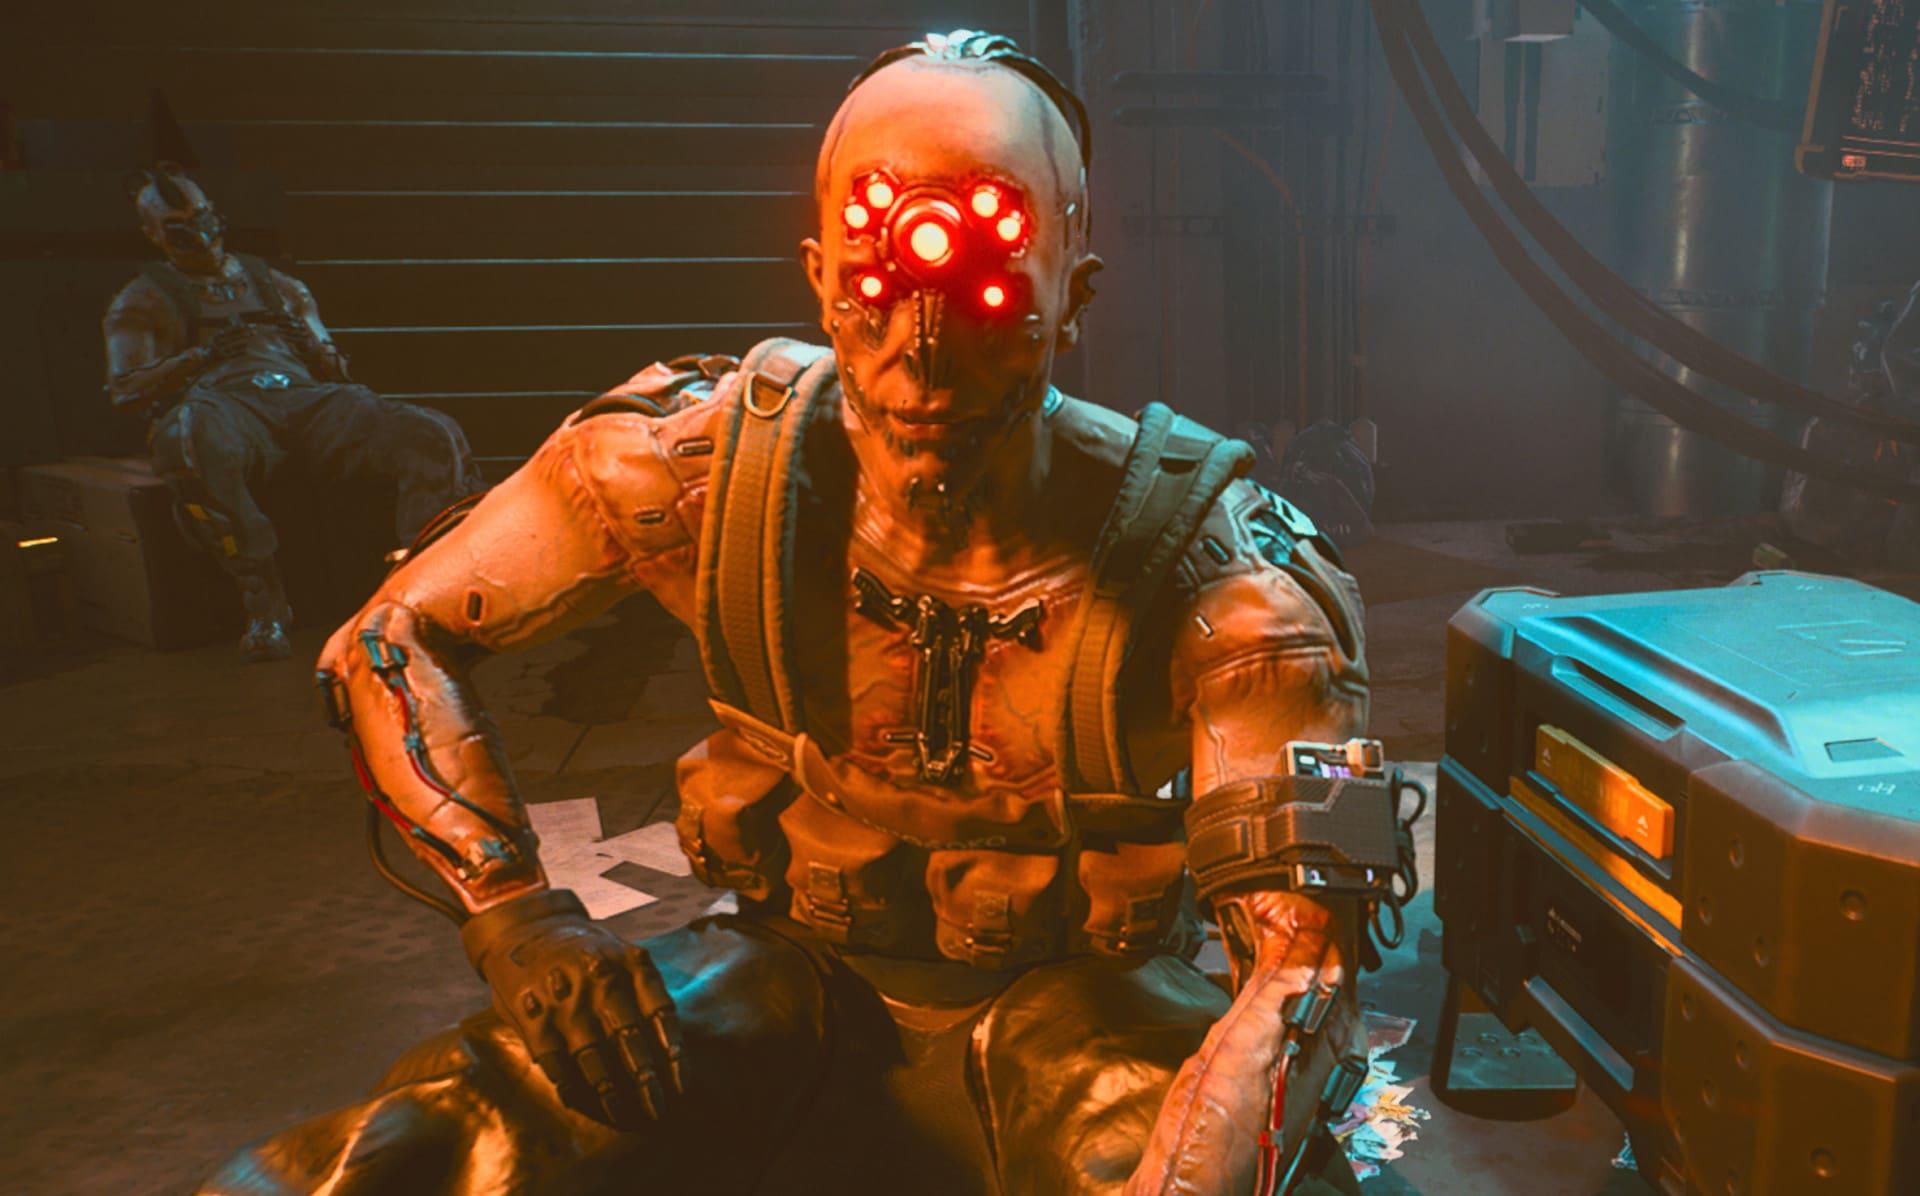 Cyberpunk 2077 transhumanism cyber surgery body augmentation enhancement cyberpsychosis no spider legs Darth Maul from CD Projekt Red CDPR